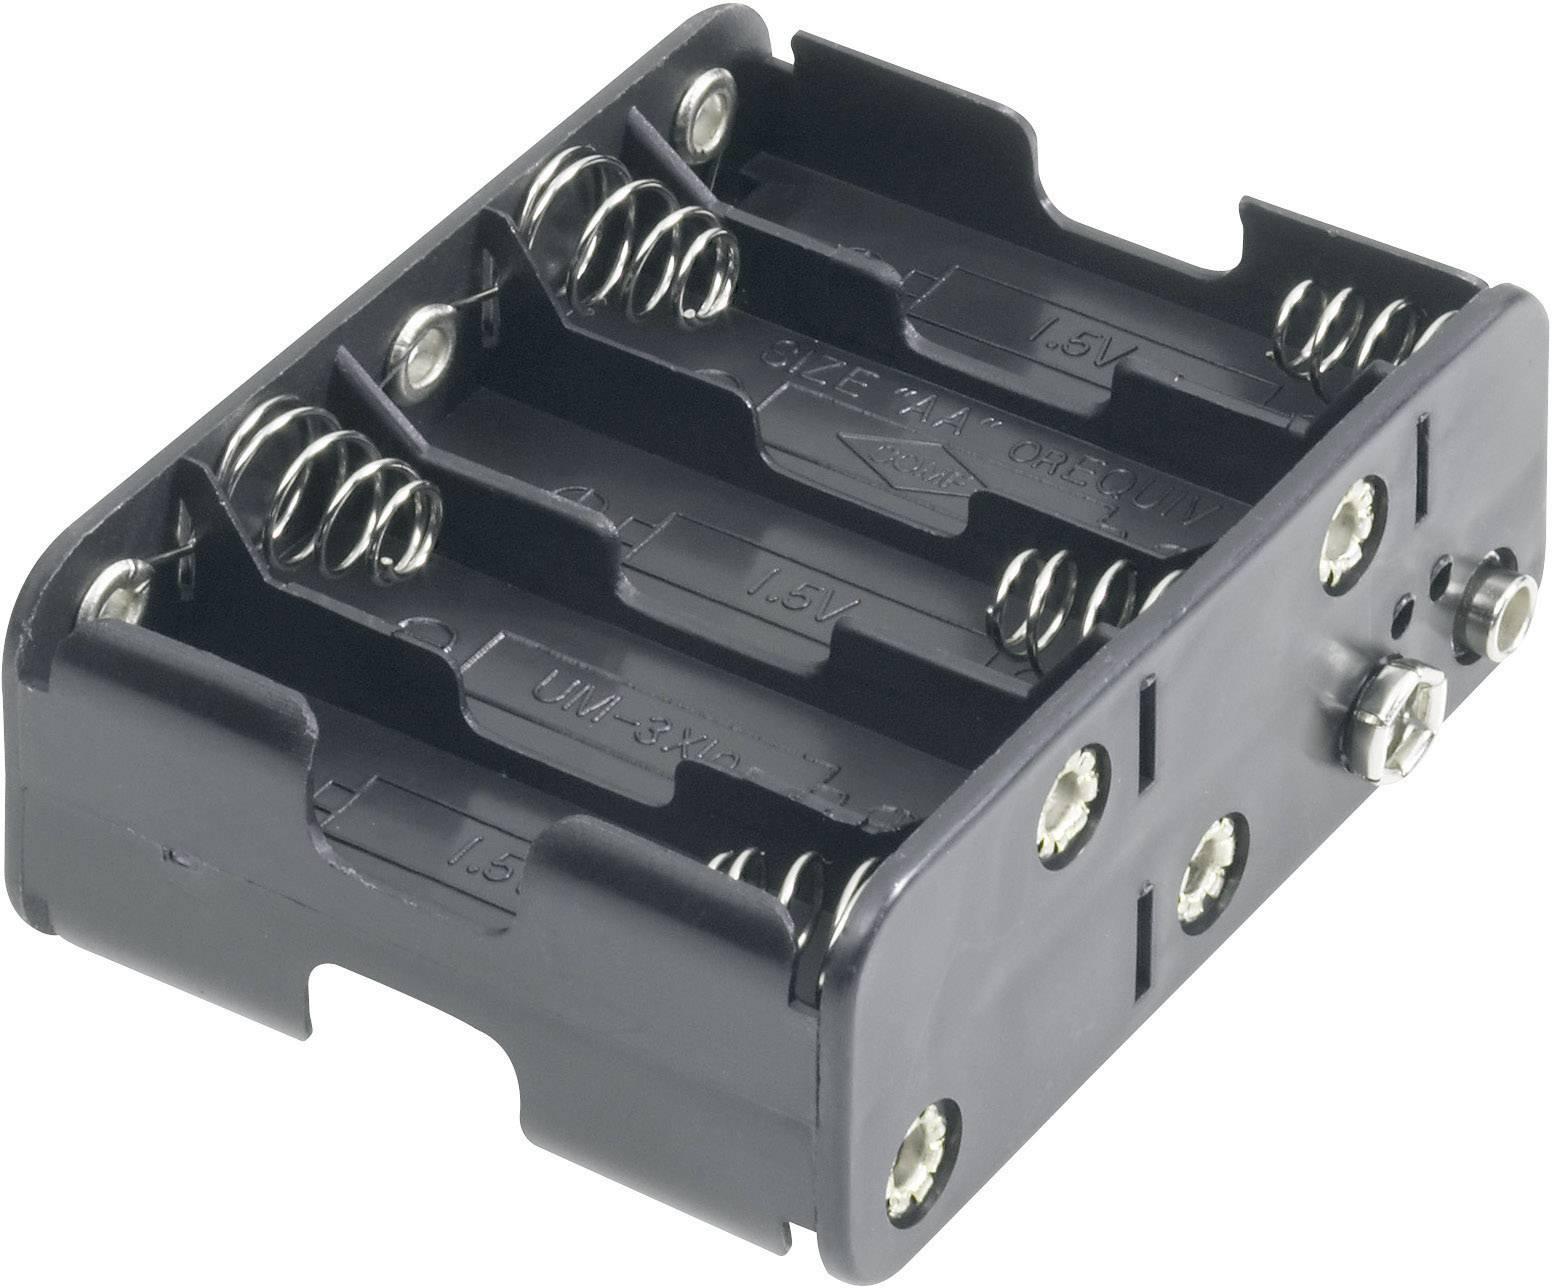 Batériový držák na 10x mignon (AA) Goobay 12460, (d x š x v) 77 x 60 x 32 mm